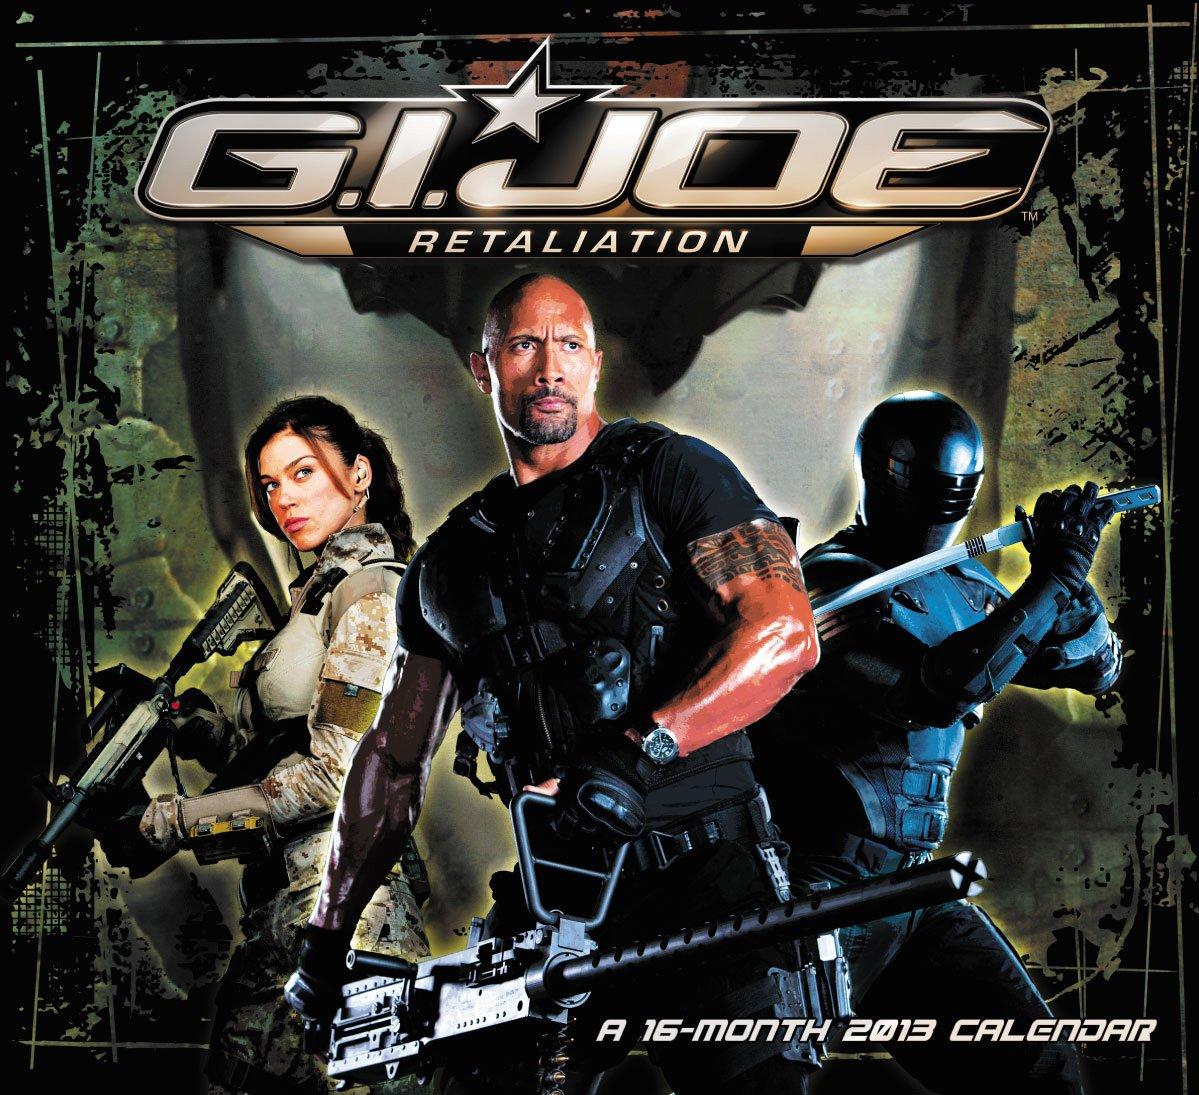 download film g.i. joe retaliation subtitle indonesia | zilla movies